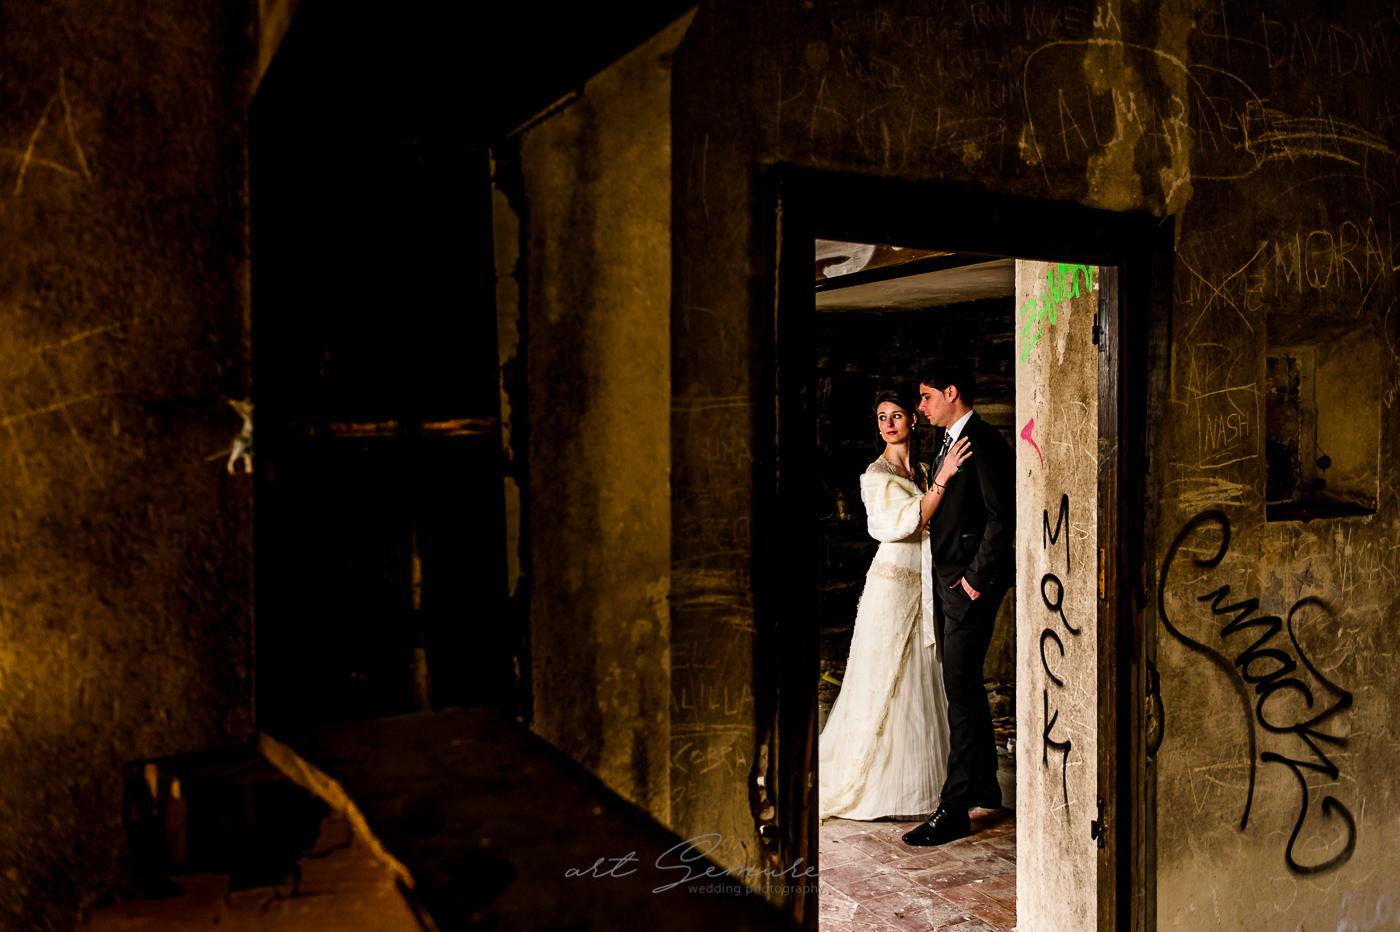 fotografo boda emotiva zamora salto de castro 05_